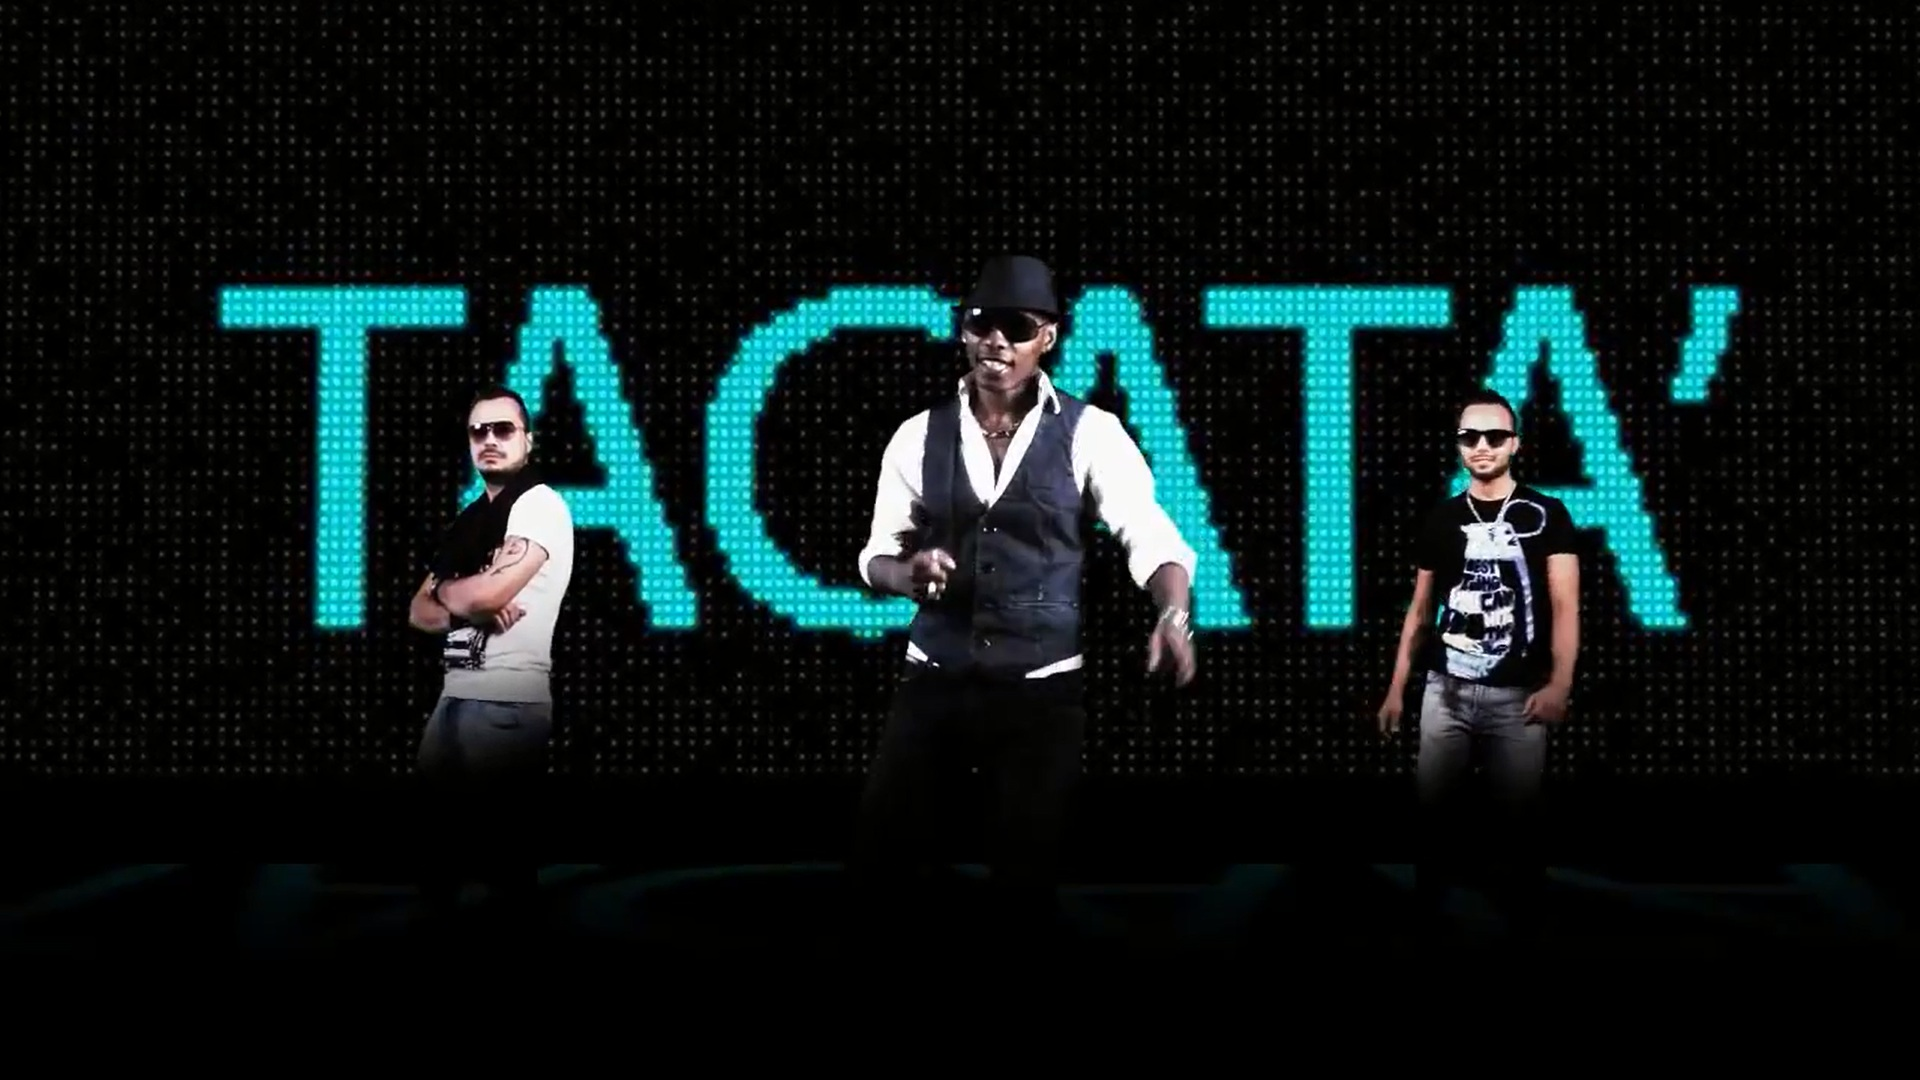 Romano_&_Sapienza_-_Tacatà_screenshot